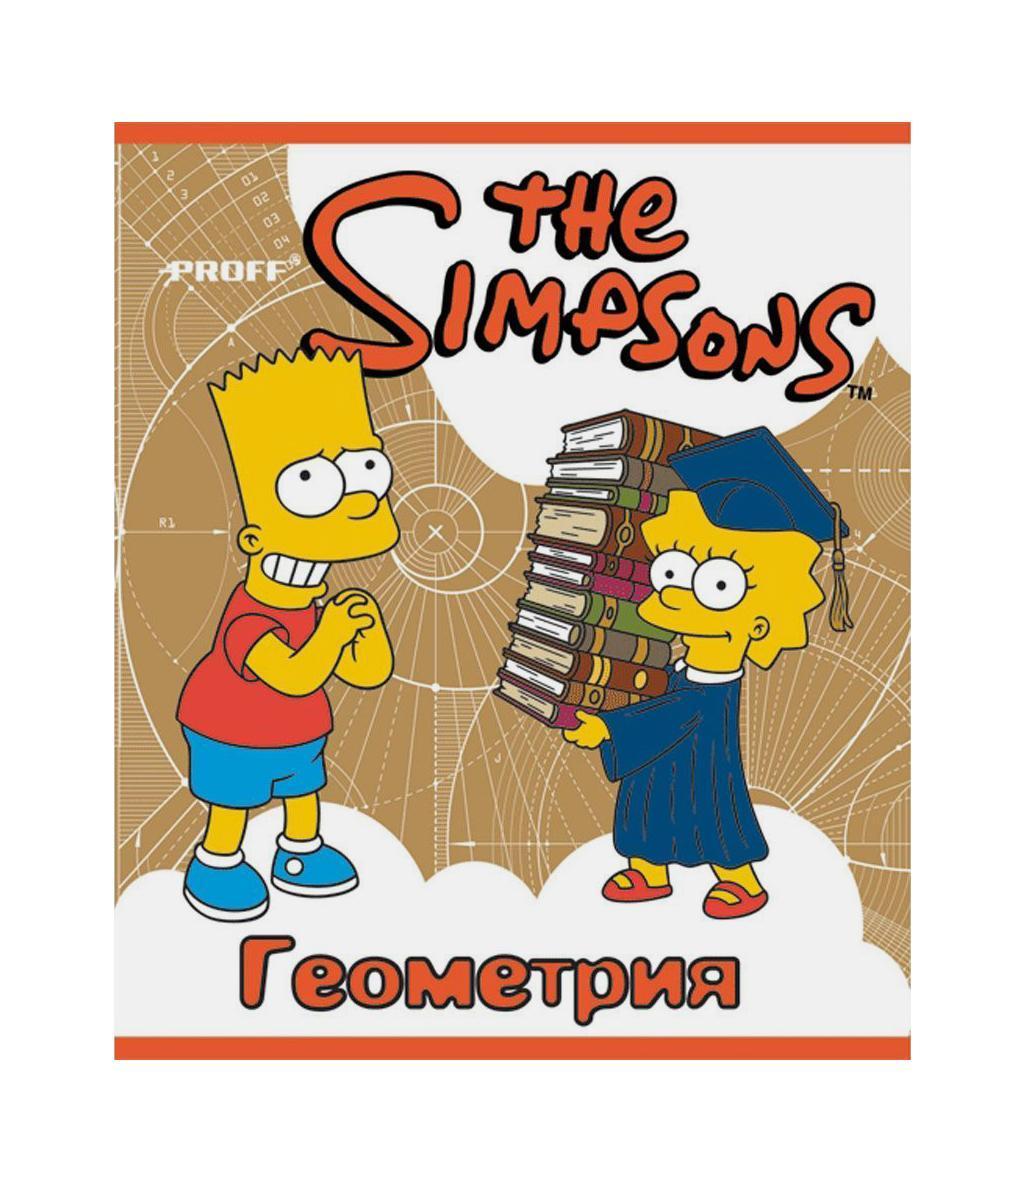 Тетрадь Proff The Simpsons The Simpsons SI14-TEBS48SI14-TEBS48Разметка: В клетку. Формат: А5. Обложка: Картон, . Пол: Унисекс. Возраст: Средние классы. Крепление: Скрепки.